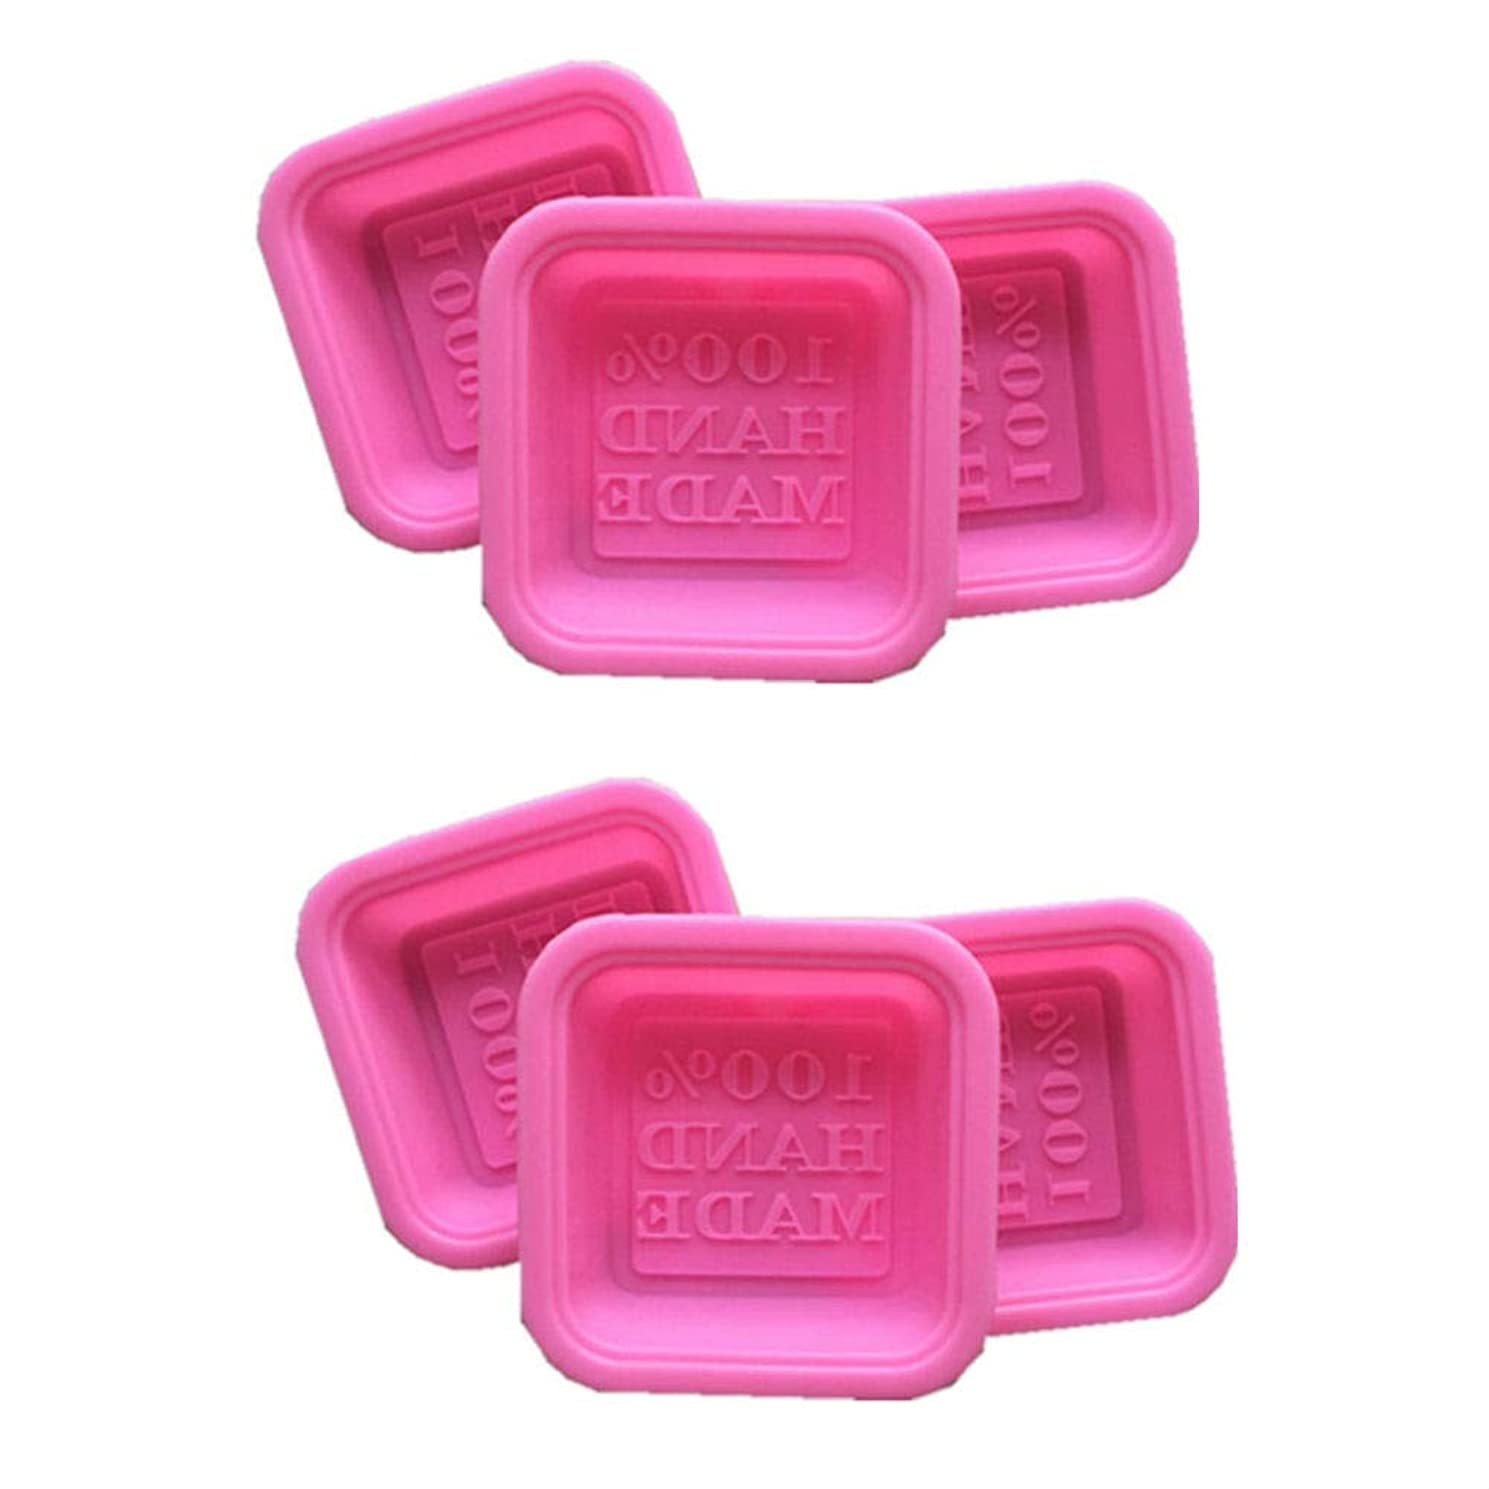 AKOAK 6 Pack Pink DIY Handmade Square Silicone Soap Molds - 100% Handmade - for Soap Making Handmade Baking Tool Soap Cake Decorating